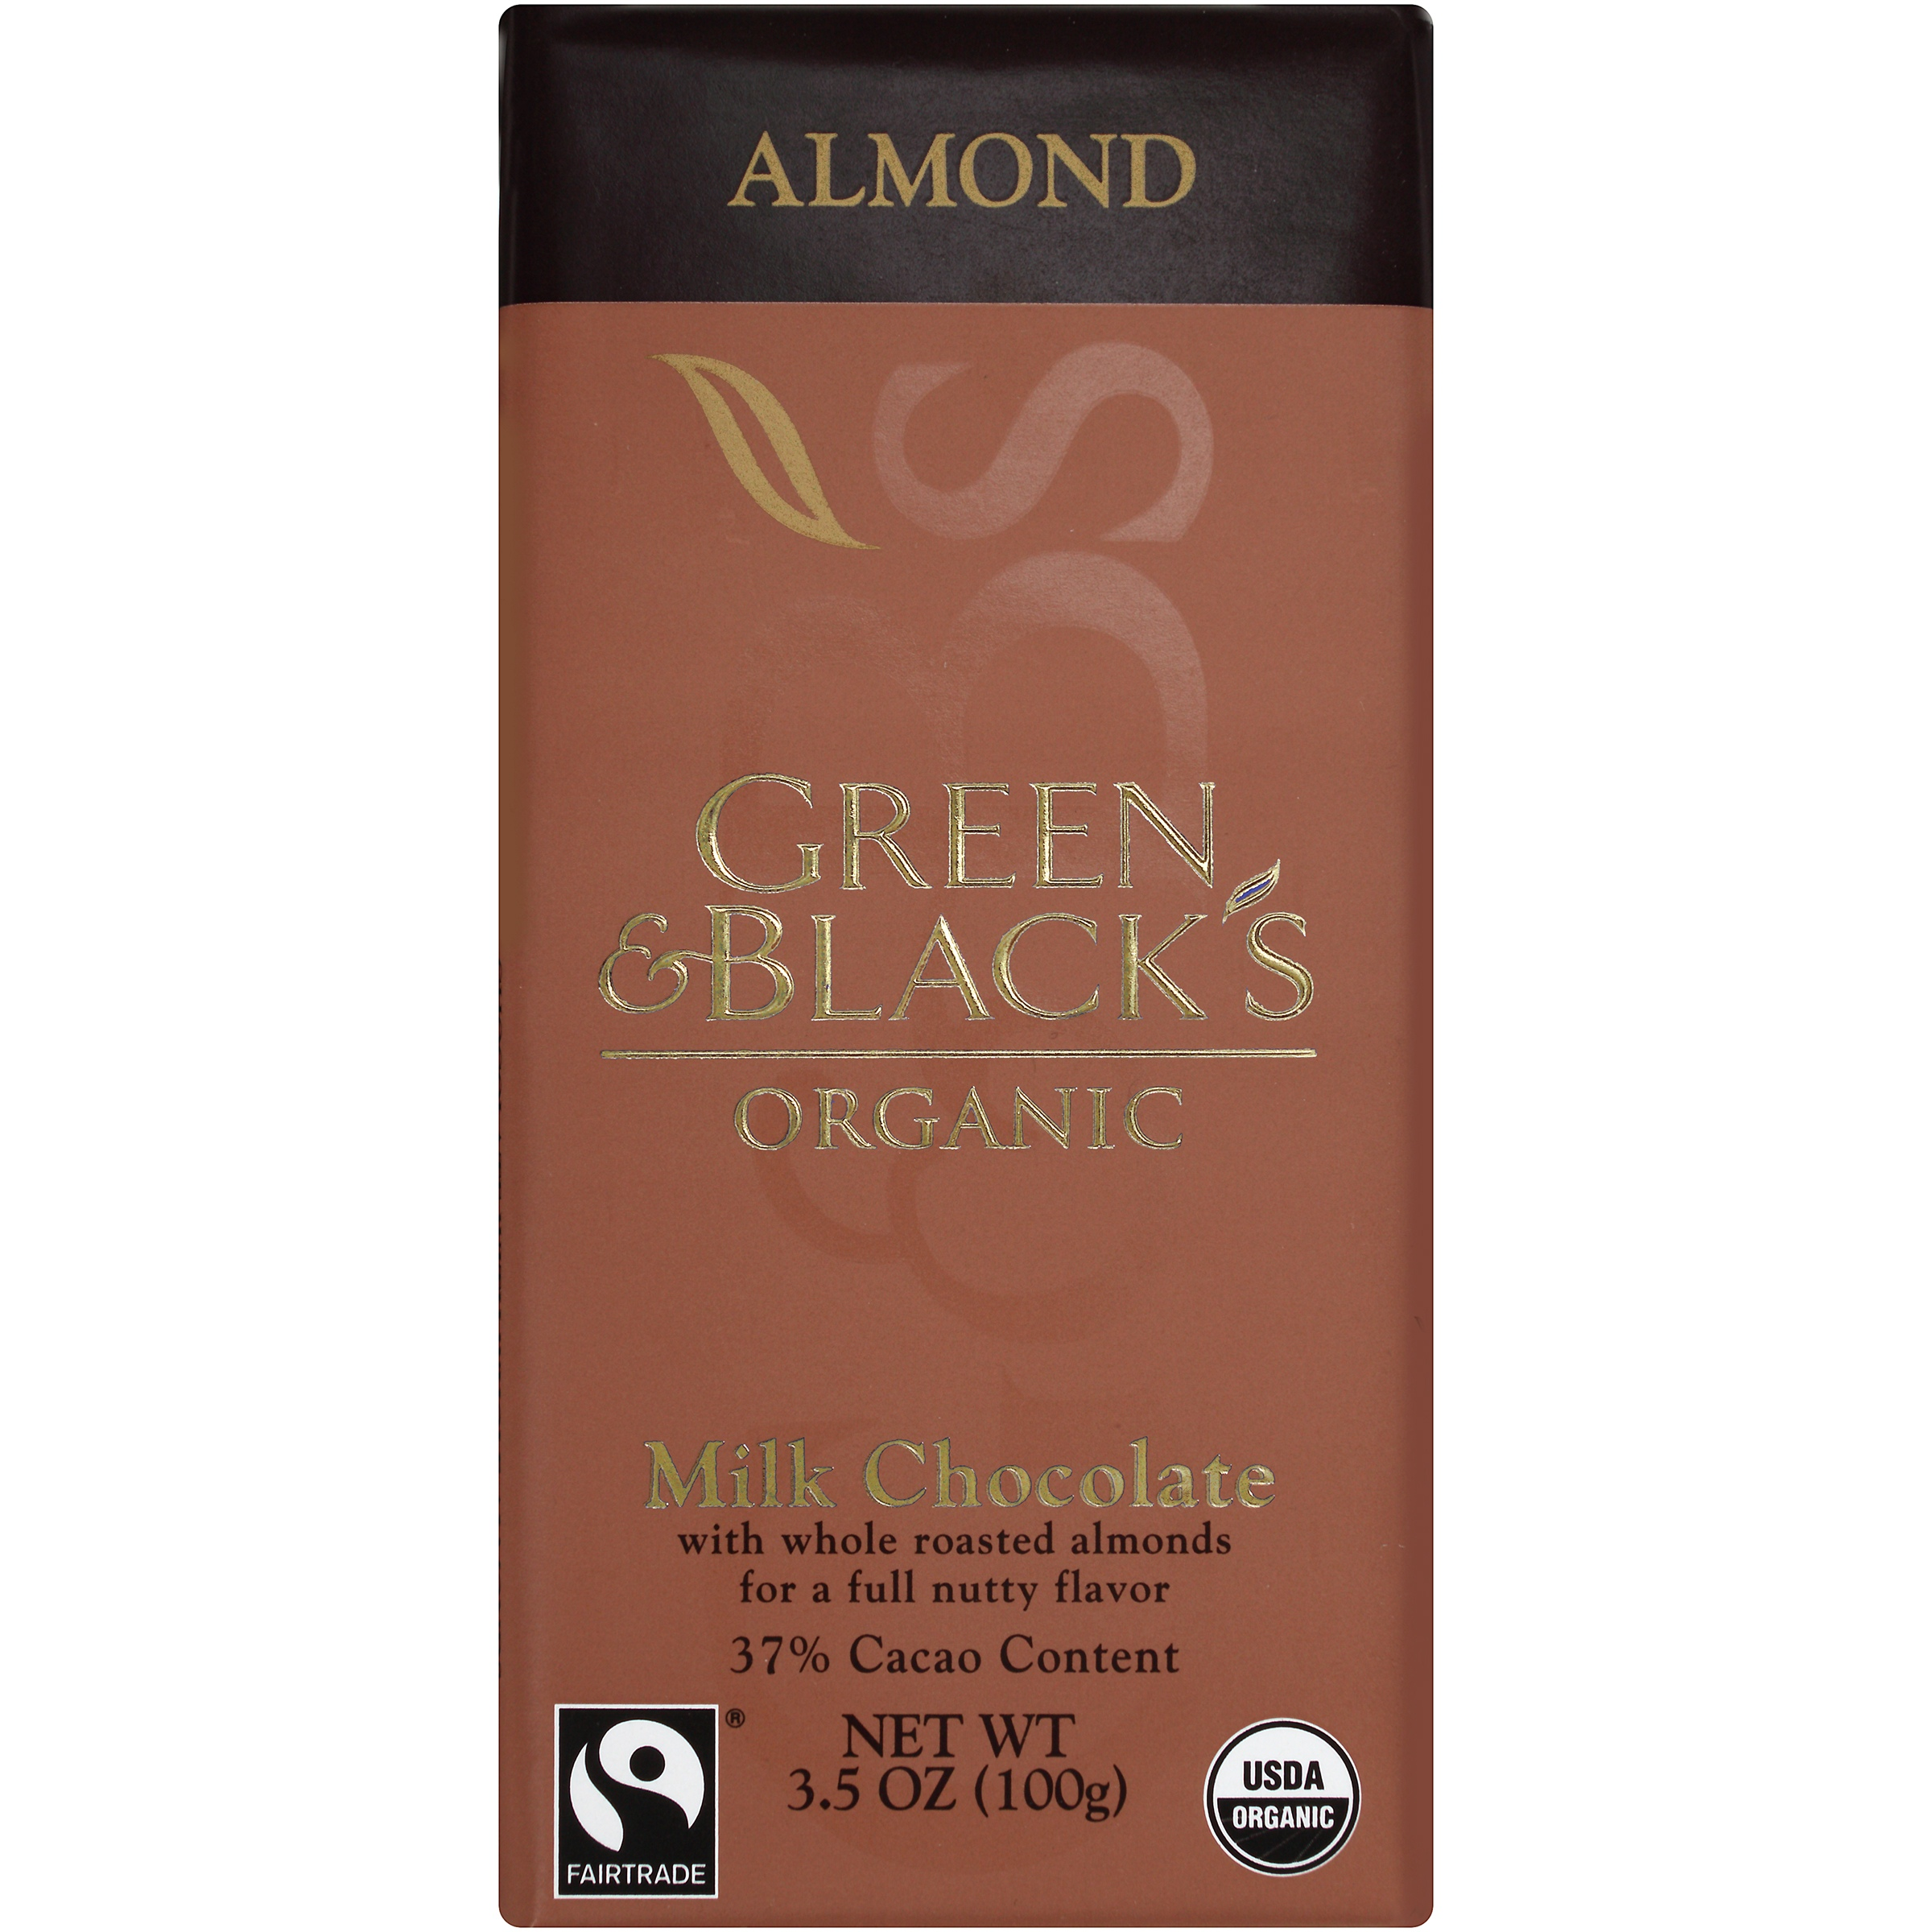 Green and Black's Organic Milk Chocolate Almond, 3.5 OZ by Mondelez Global LLC